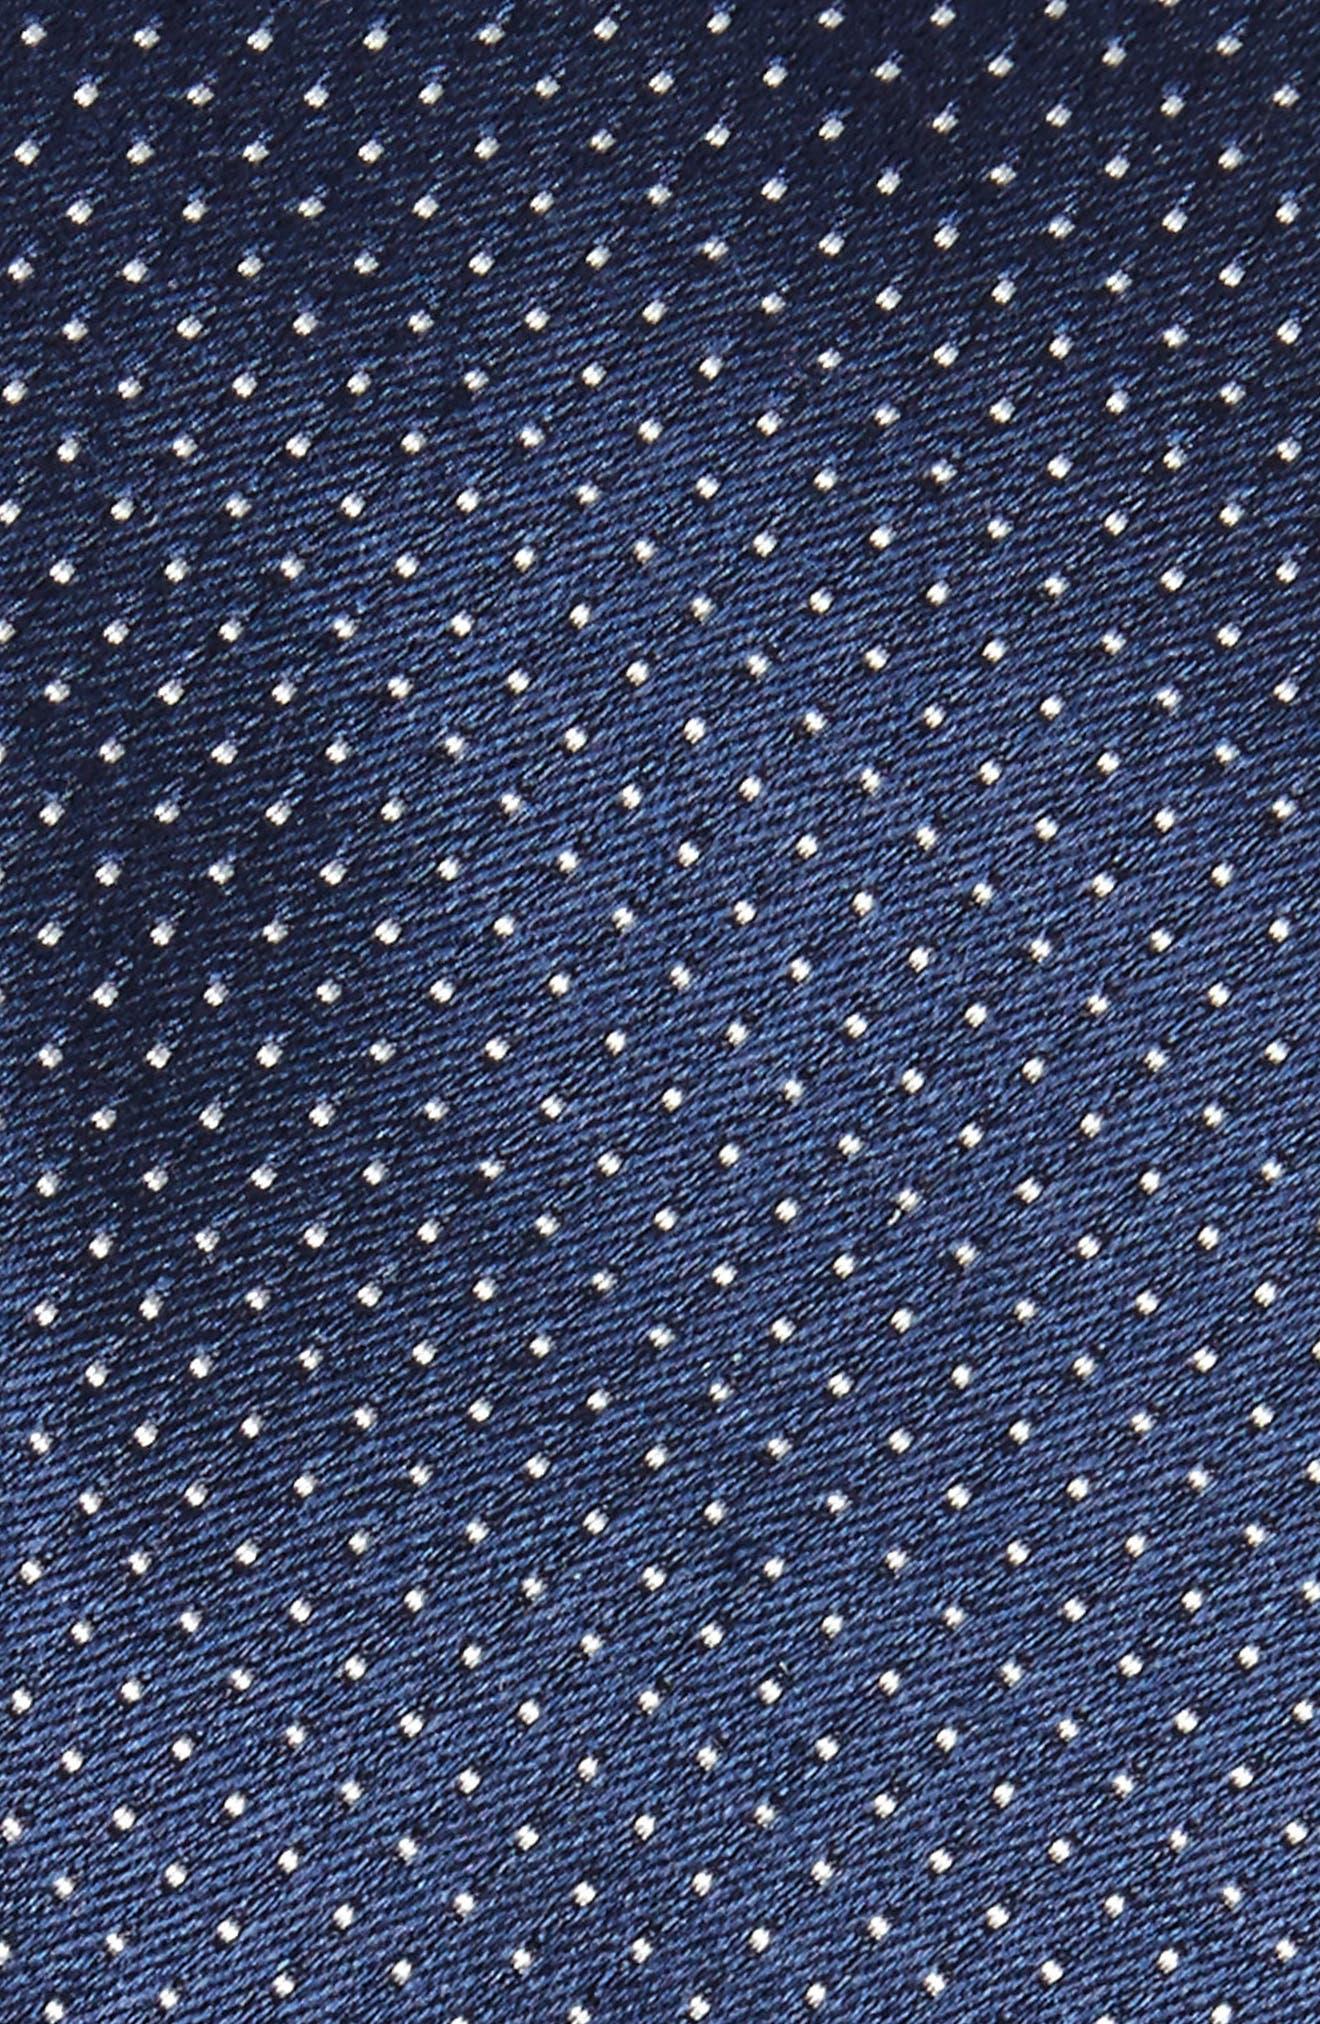 Dot Silk Skinny Tie,                             Alternate thumbnail 2, color,                             Navy